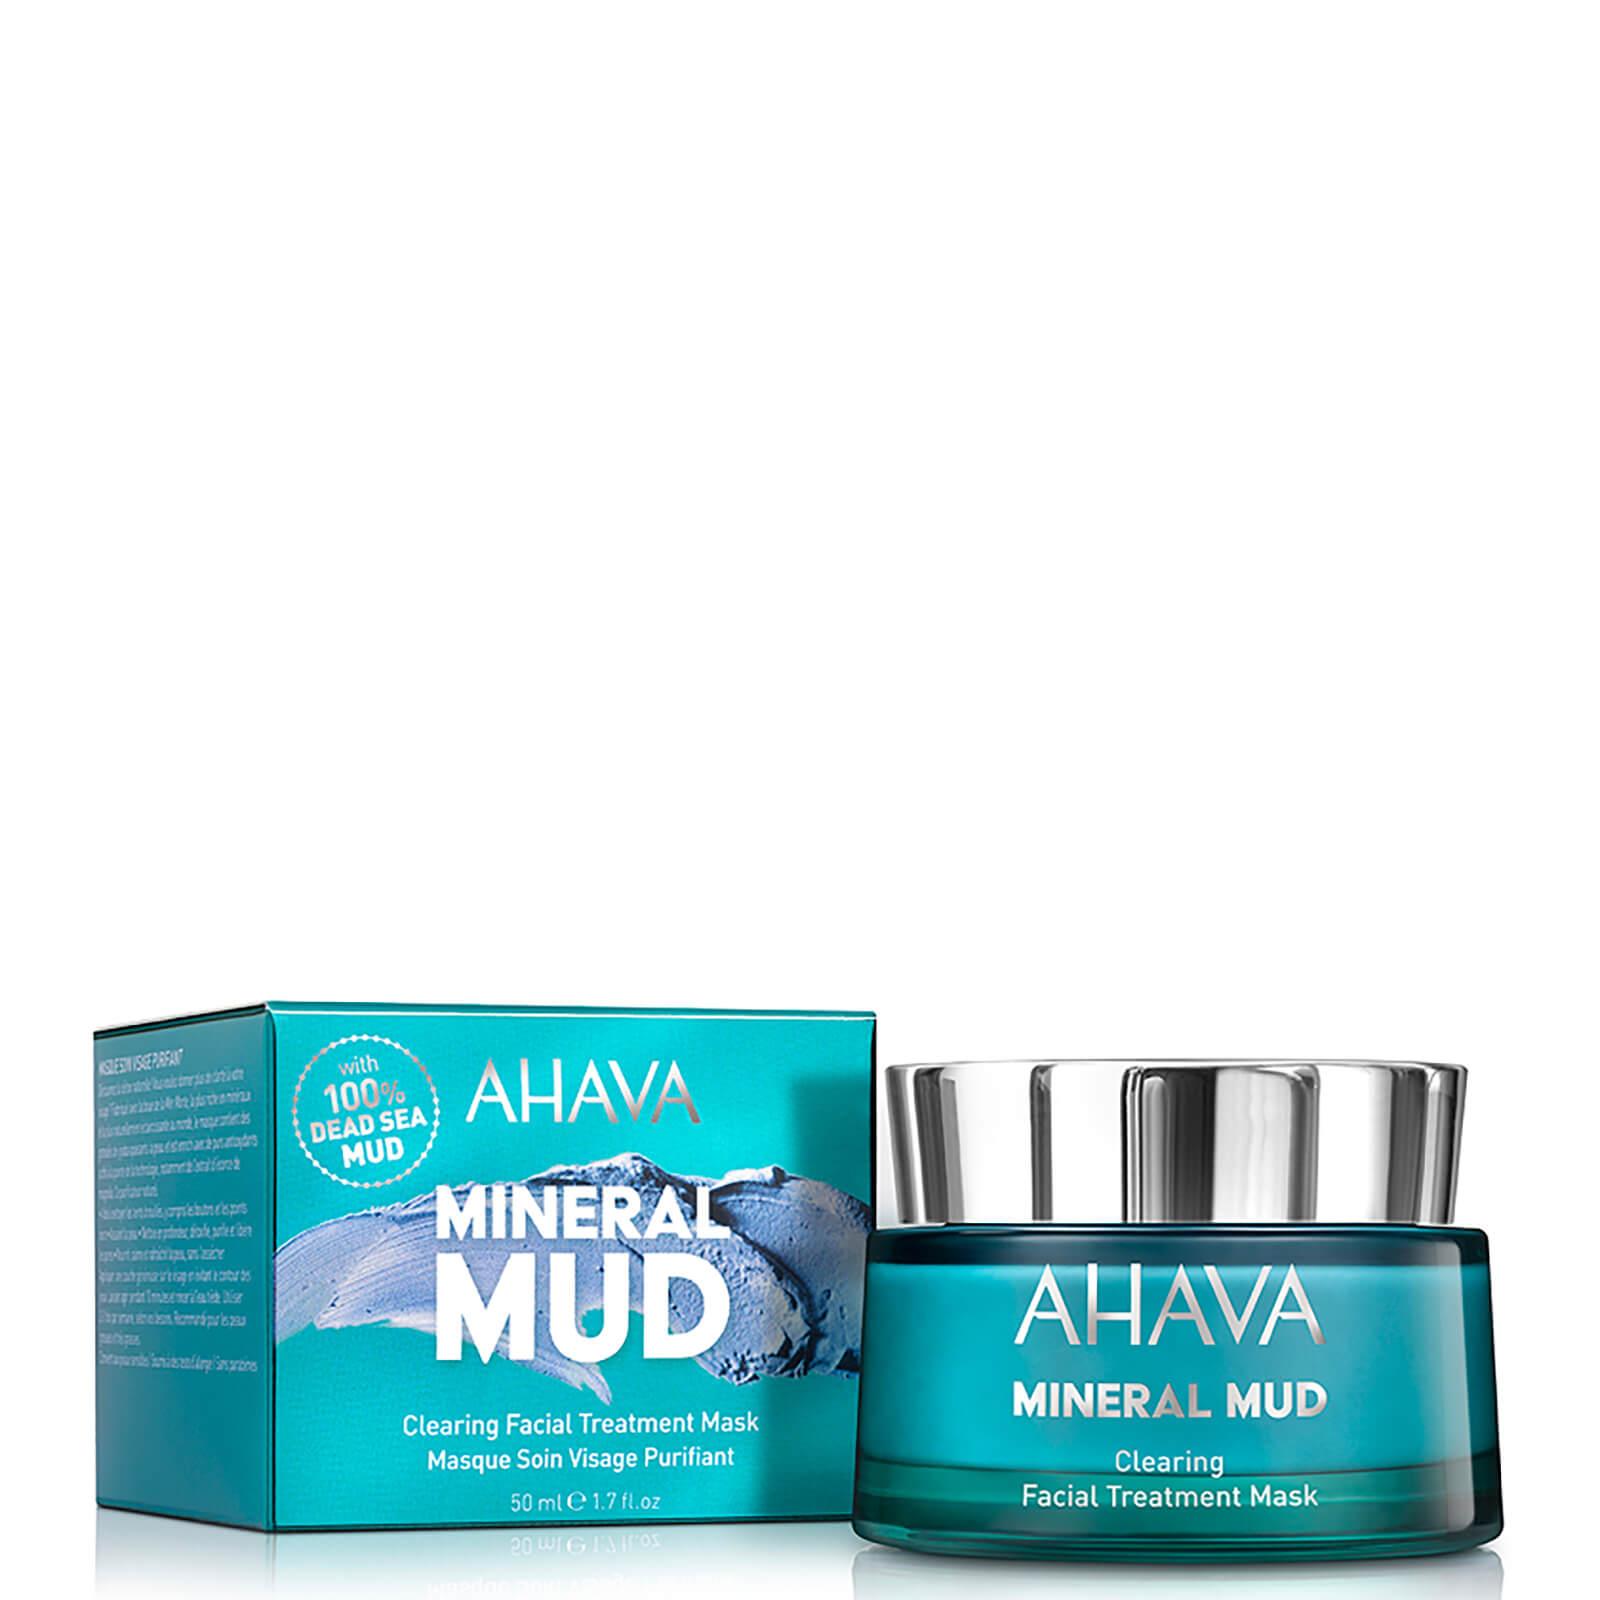 AHAVA Clearing Facial Treatment Mask 50ml